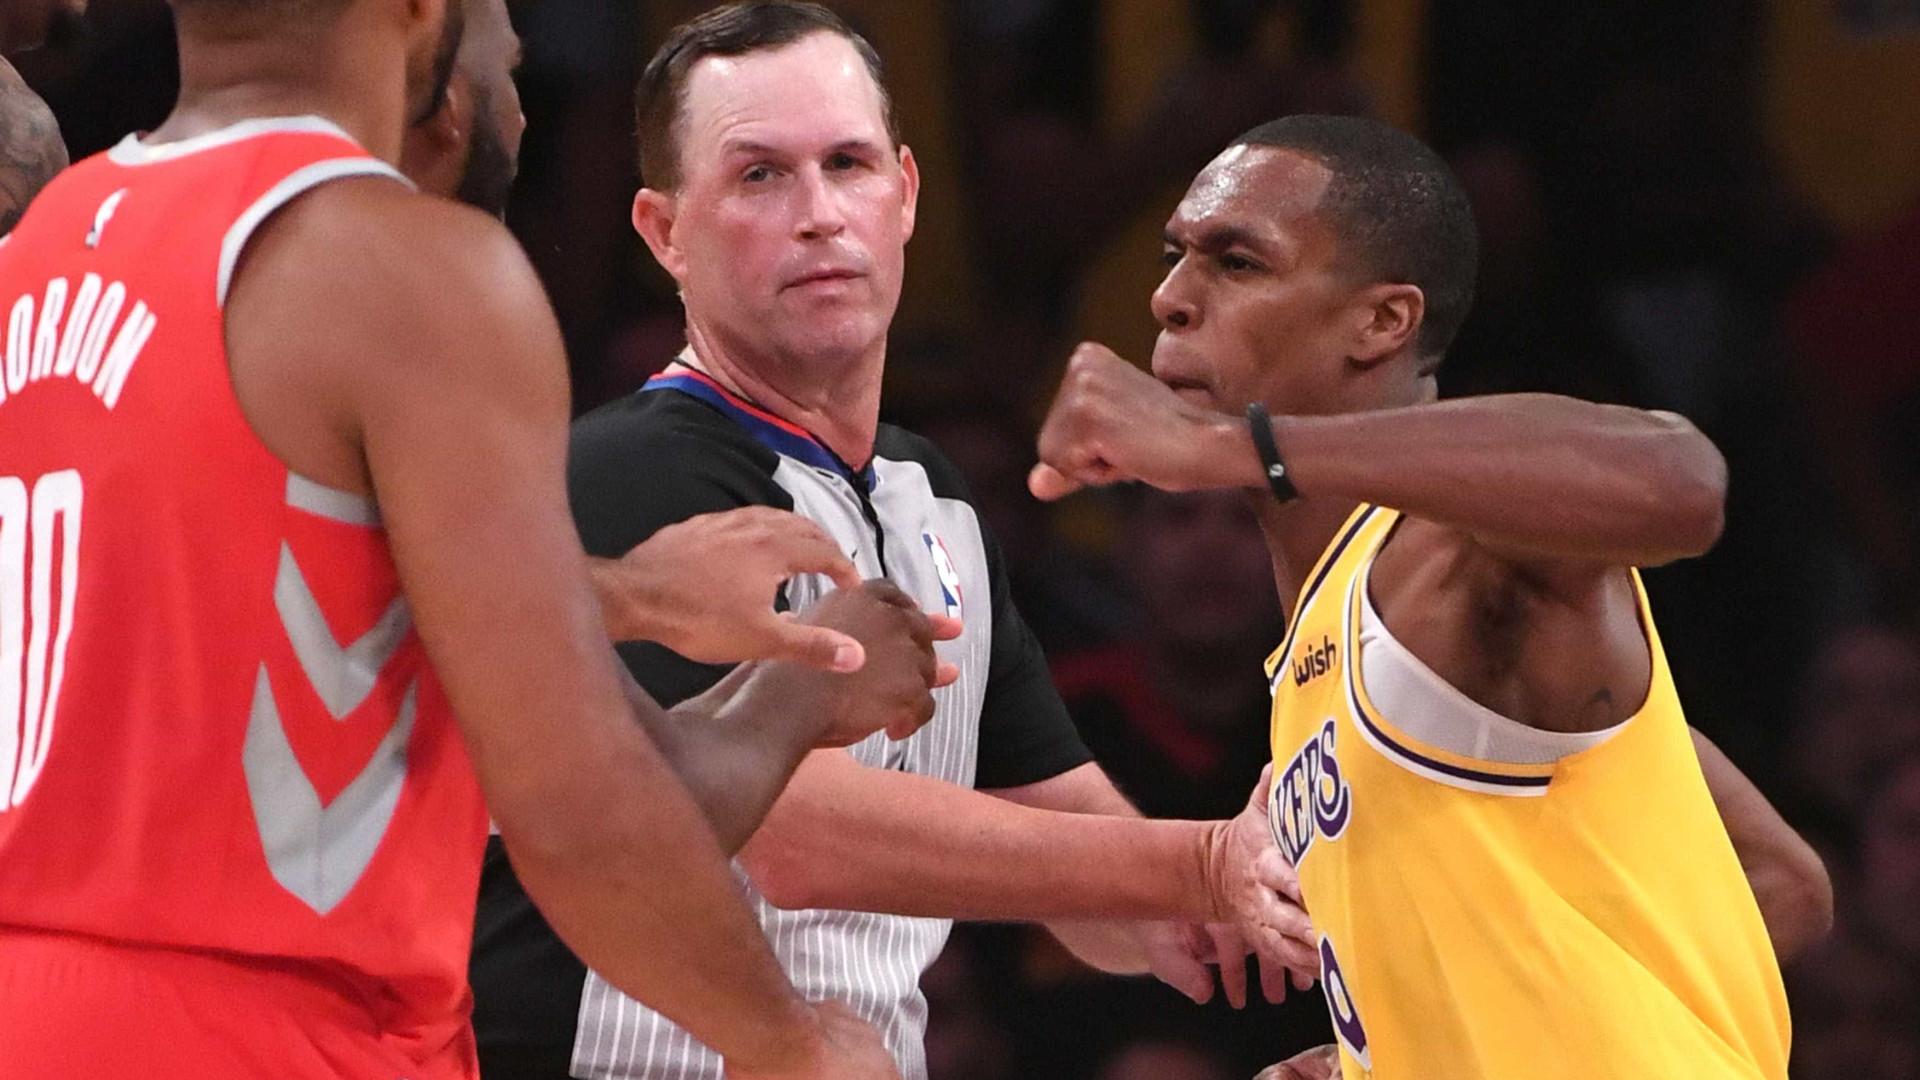 NBA: jogadores de Lakers e Rockets trocam socos durante partida